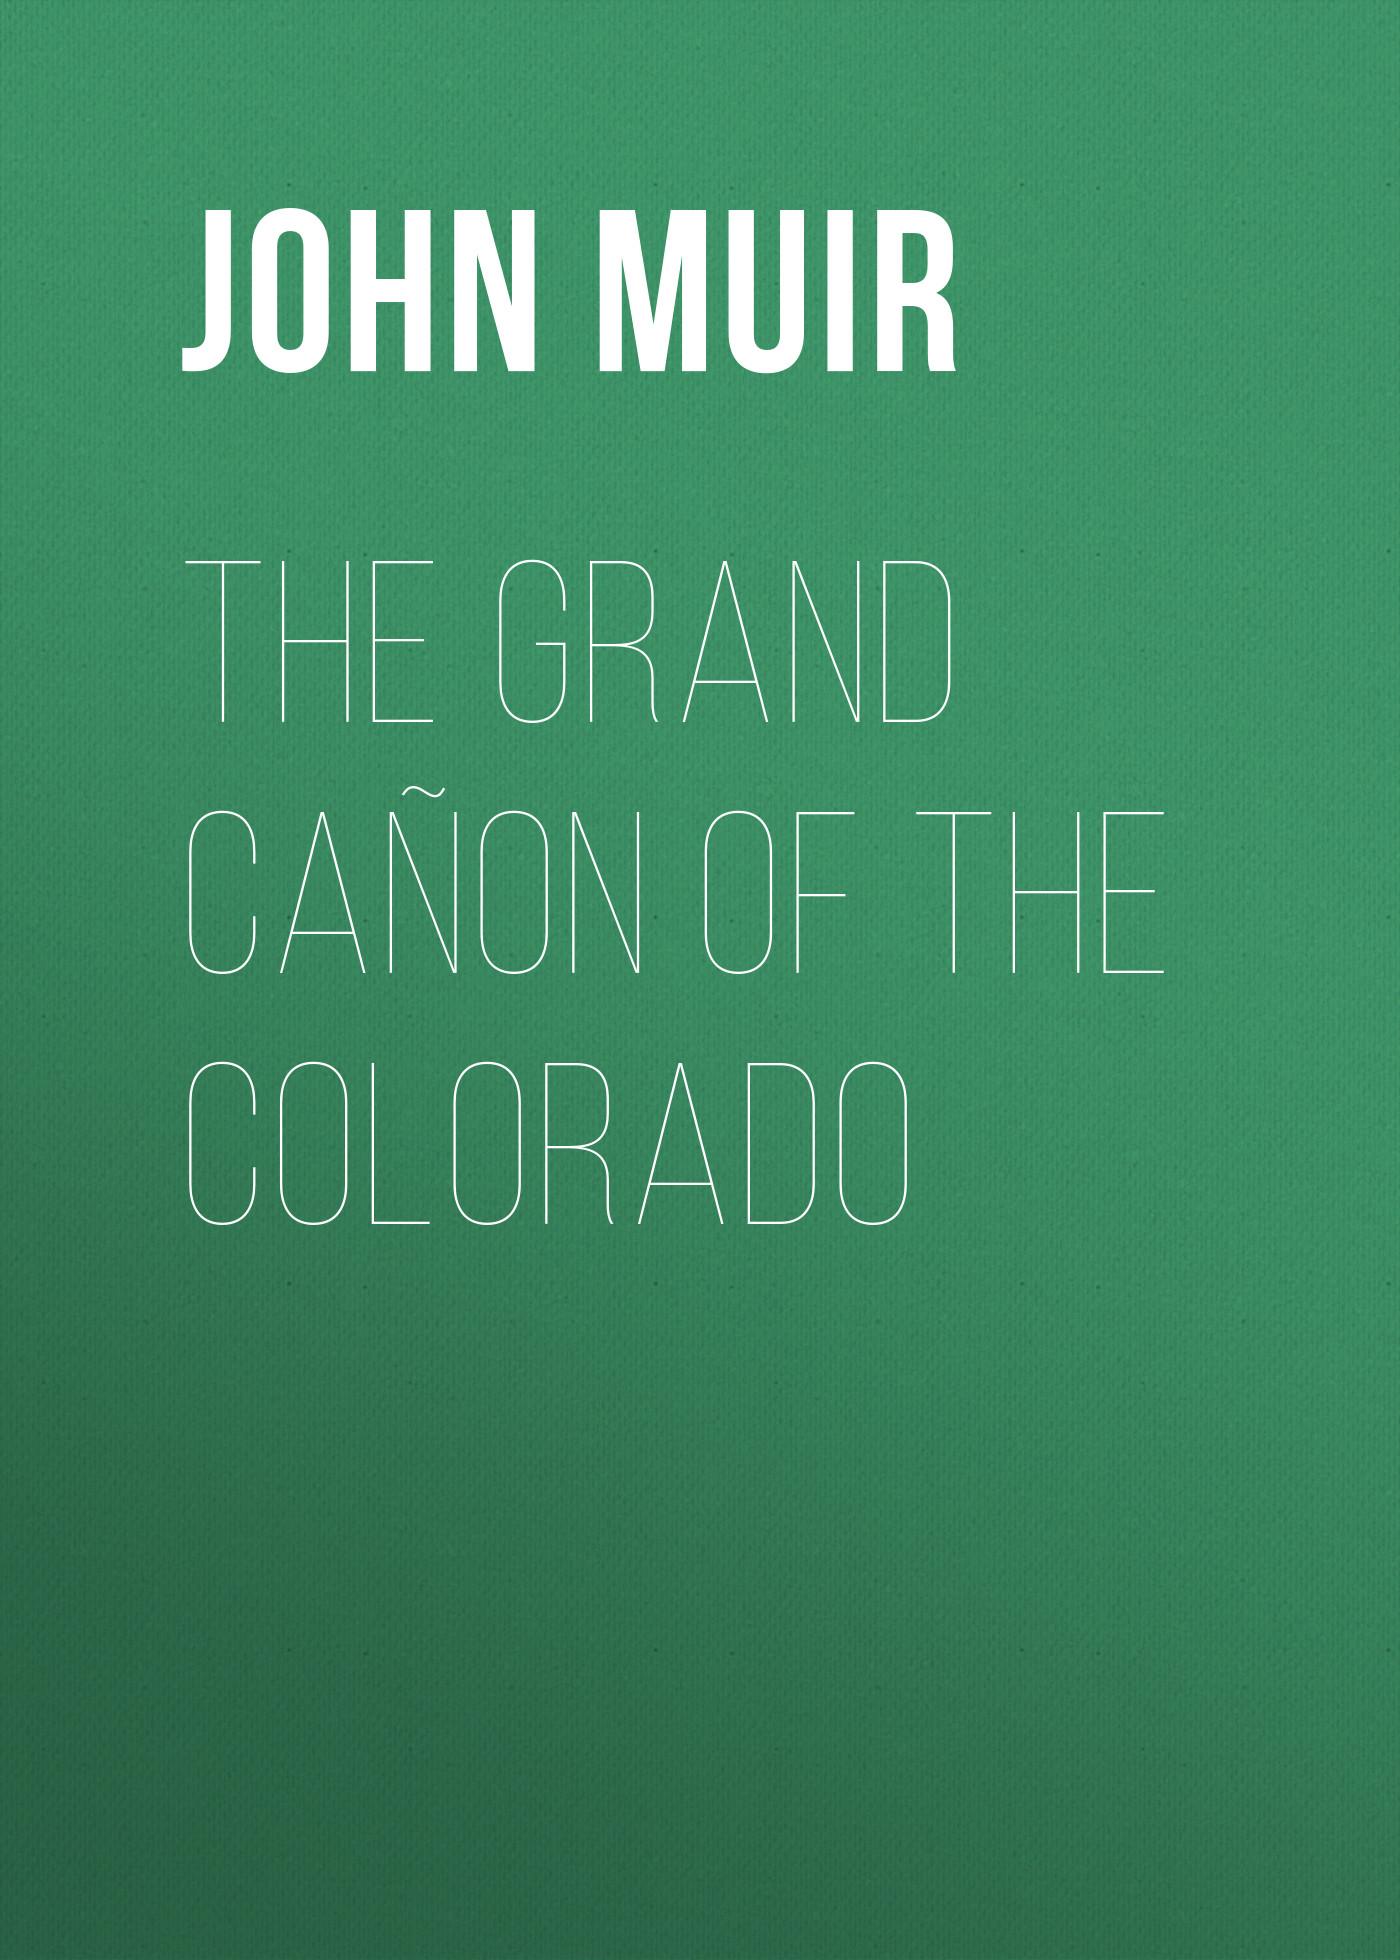 John Muir The Grand Cañon of the Colorado john muir the story of my boyhood and youth